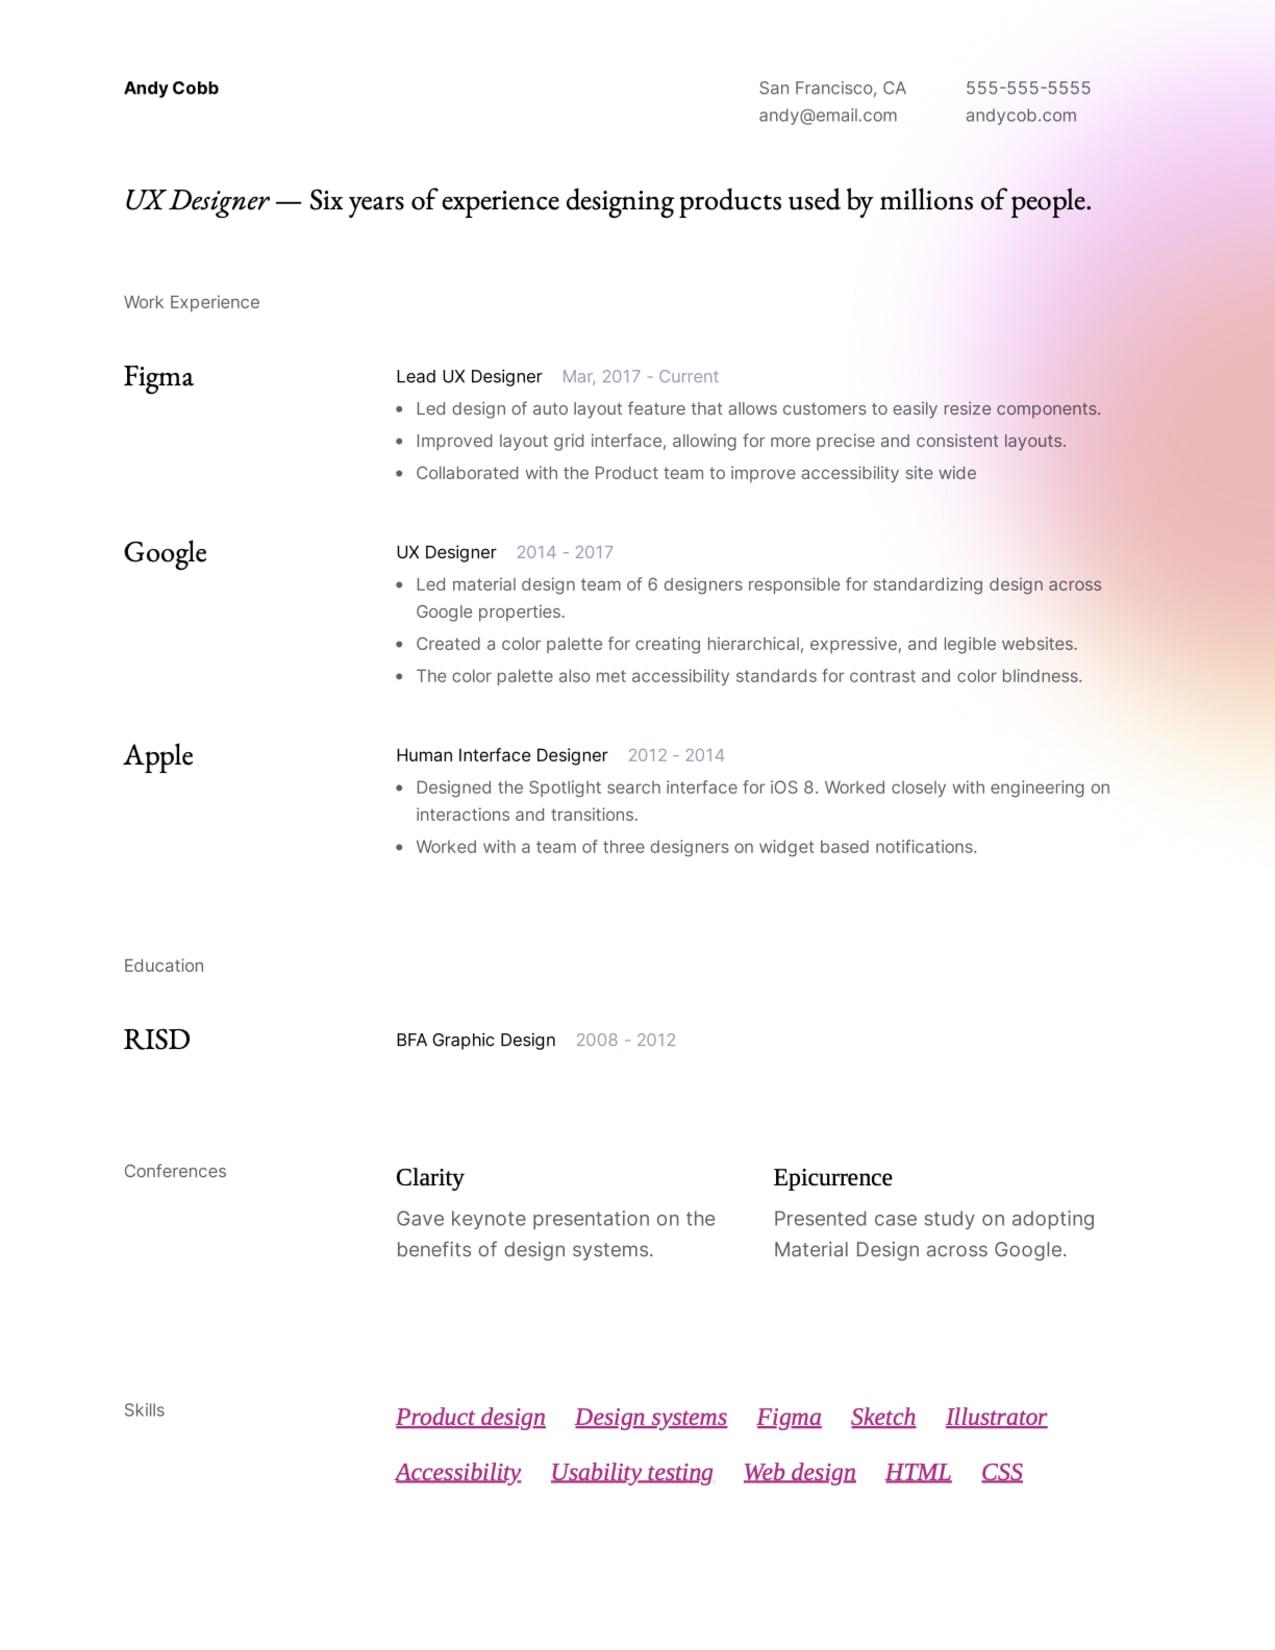 Creative UX Designer resume example.